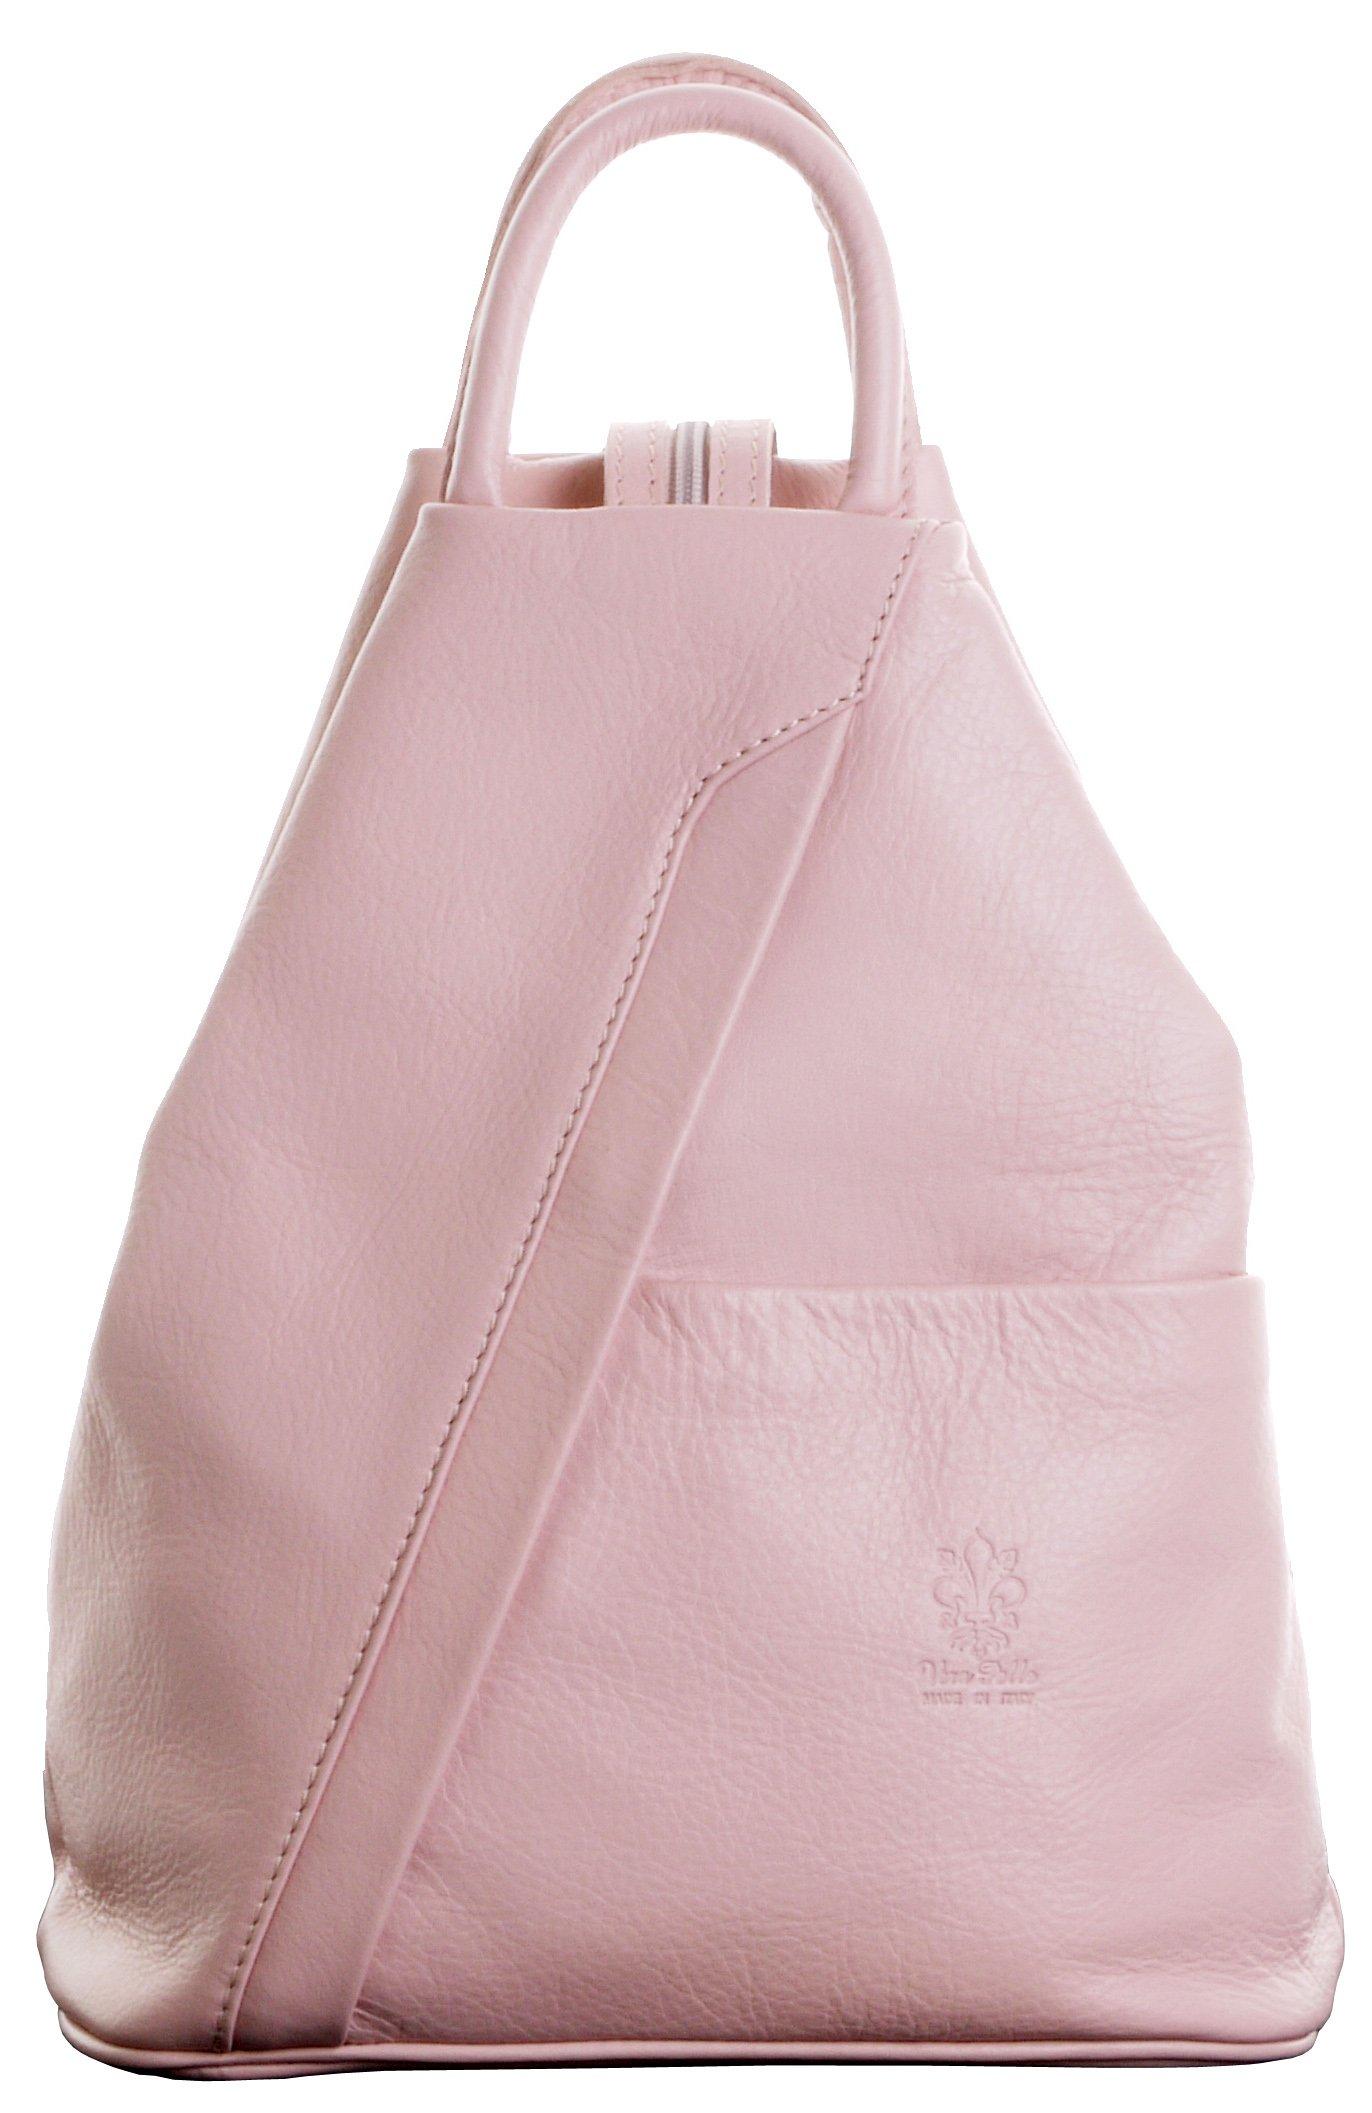 Italian Soft Napa Pink Leather Top Handle Shoulder Bag Rucksack Backpack. Includes Branded Protective Storage Bag by Primo Sacchi